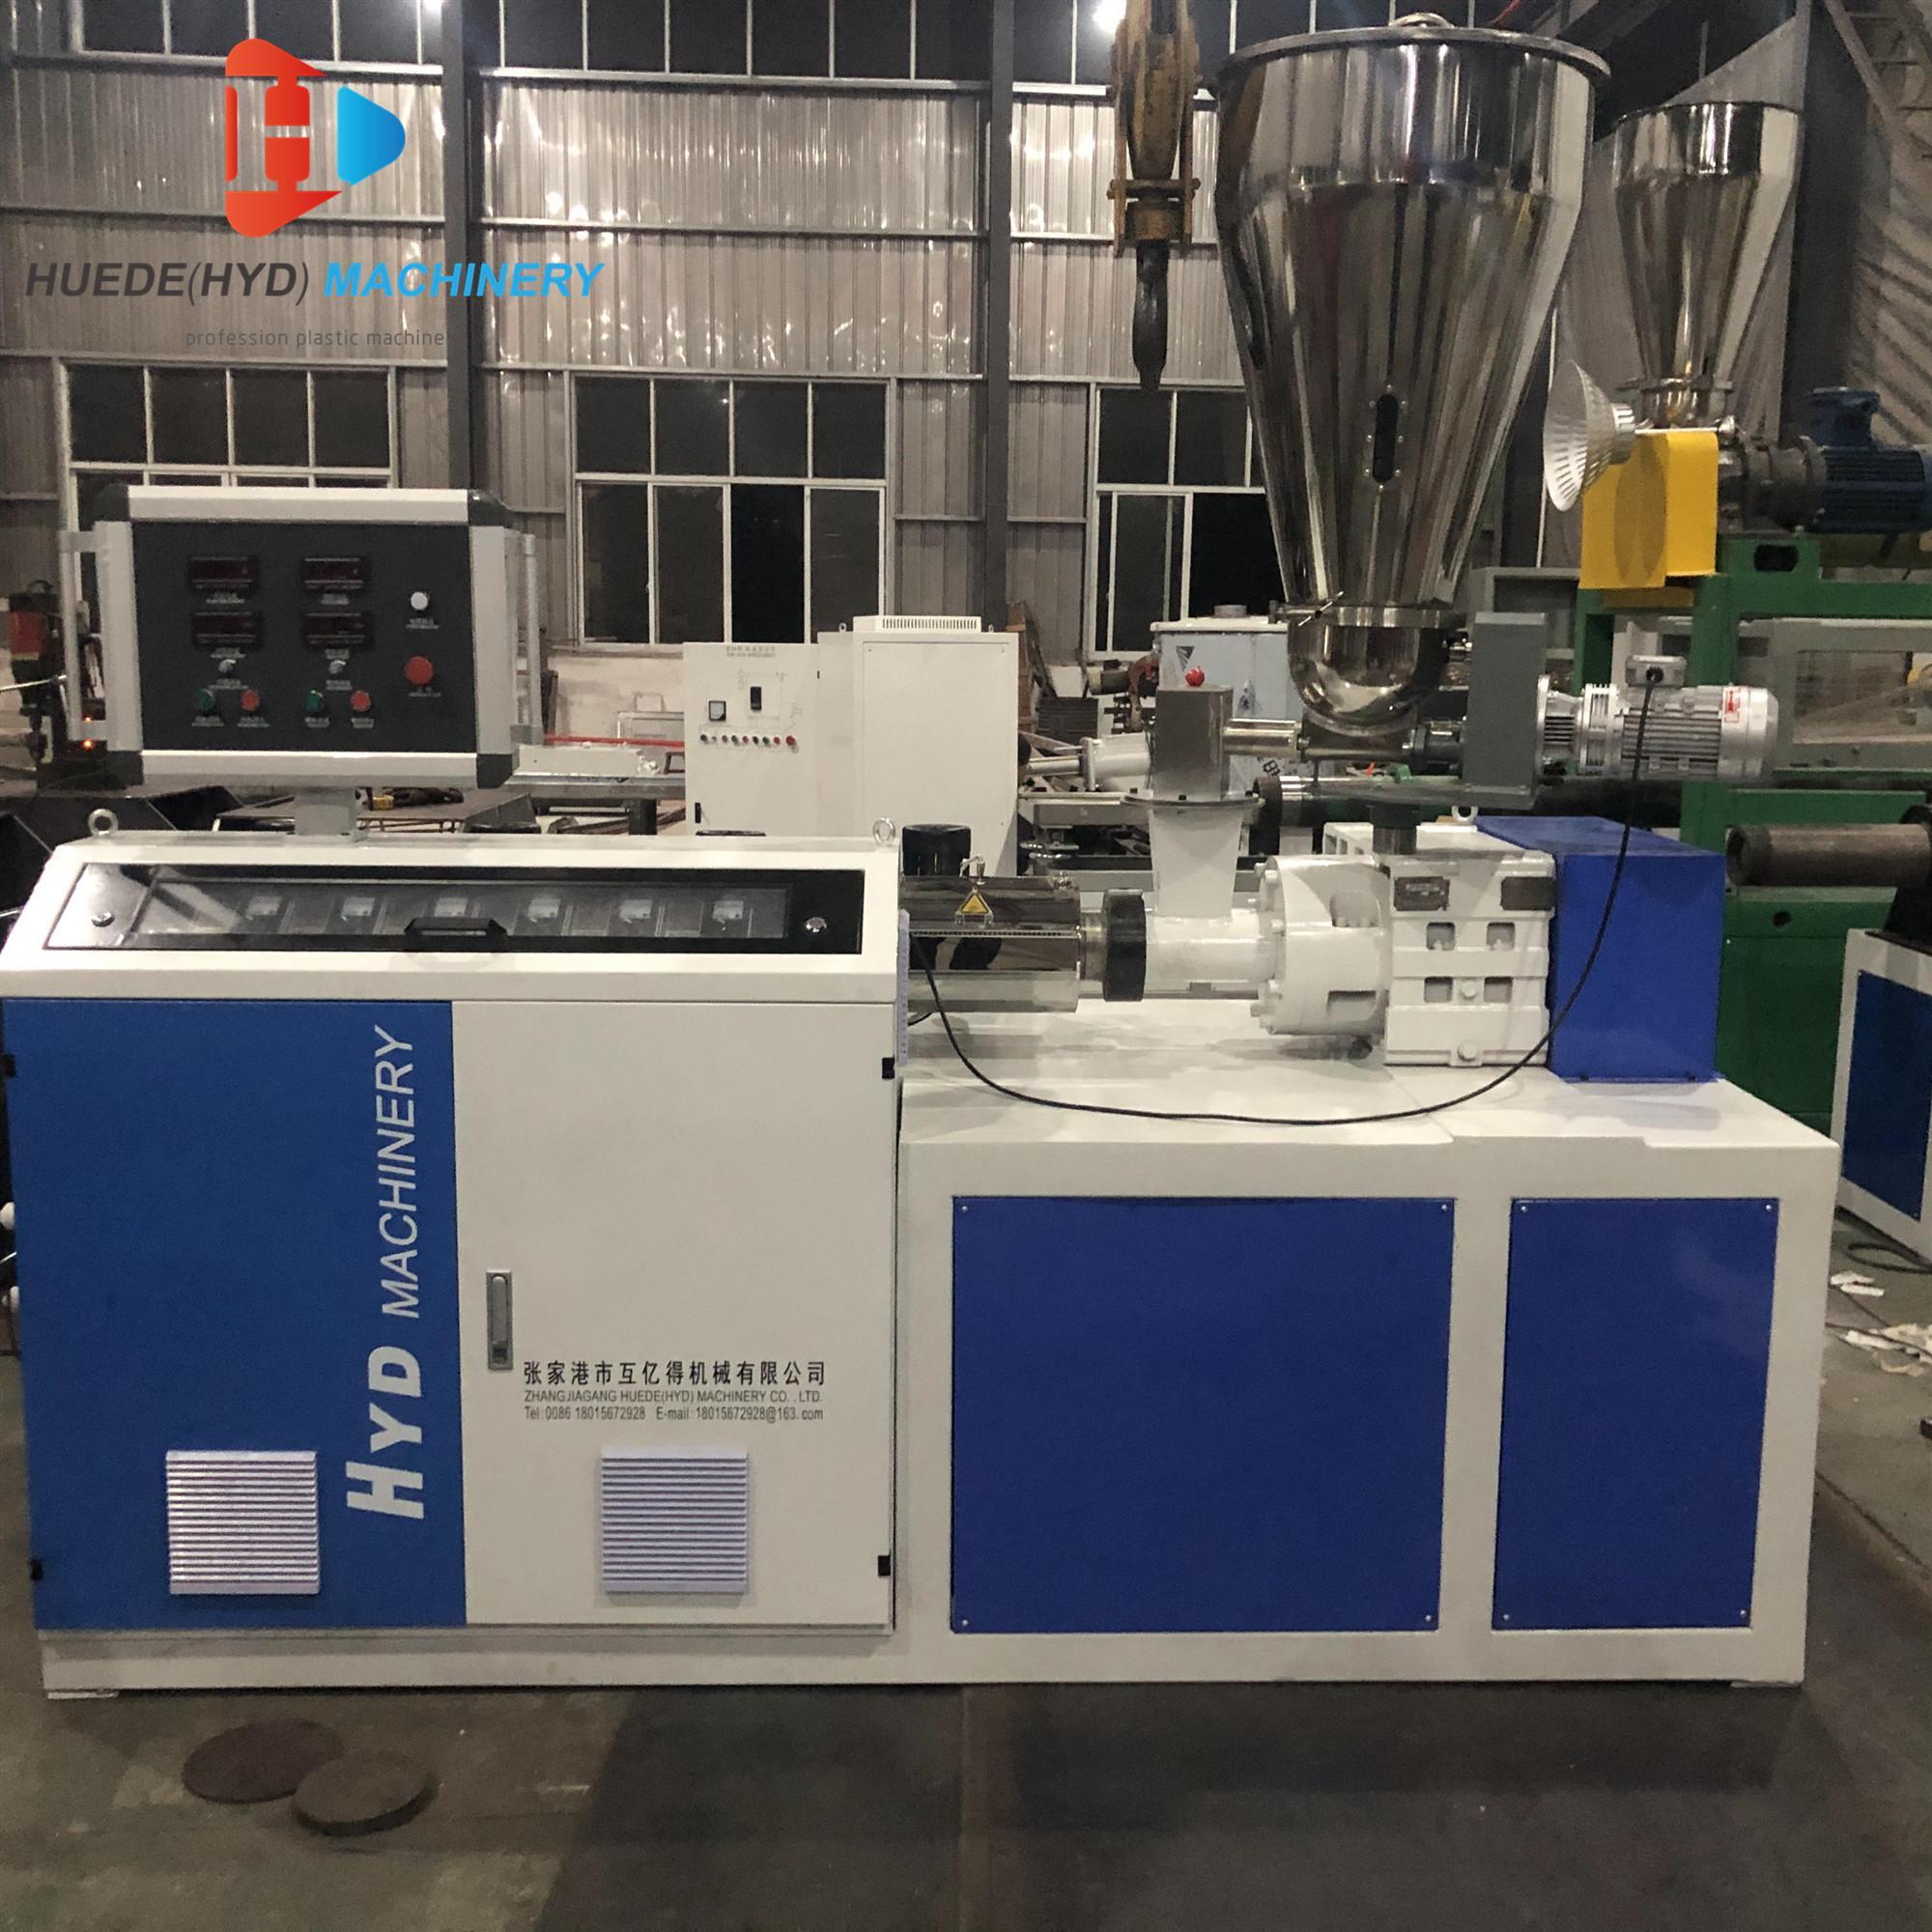 SJ50 Single Screw Extruder For HDPE Tubes ABS PVC Film Sheet Extruder Machine 4